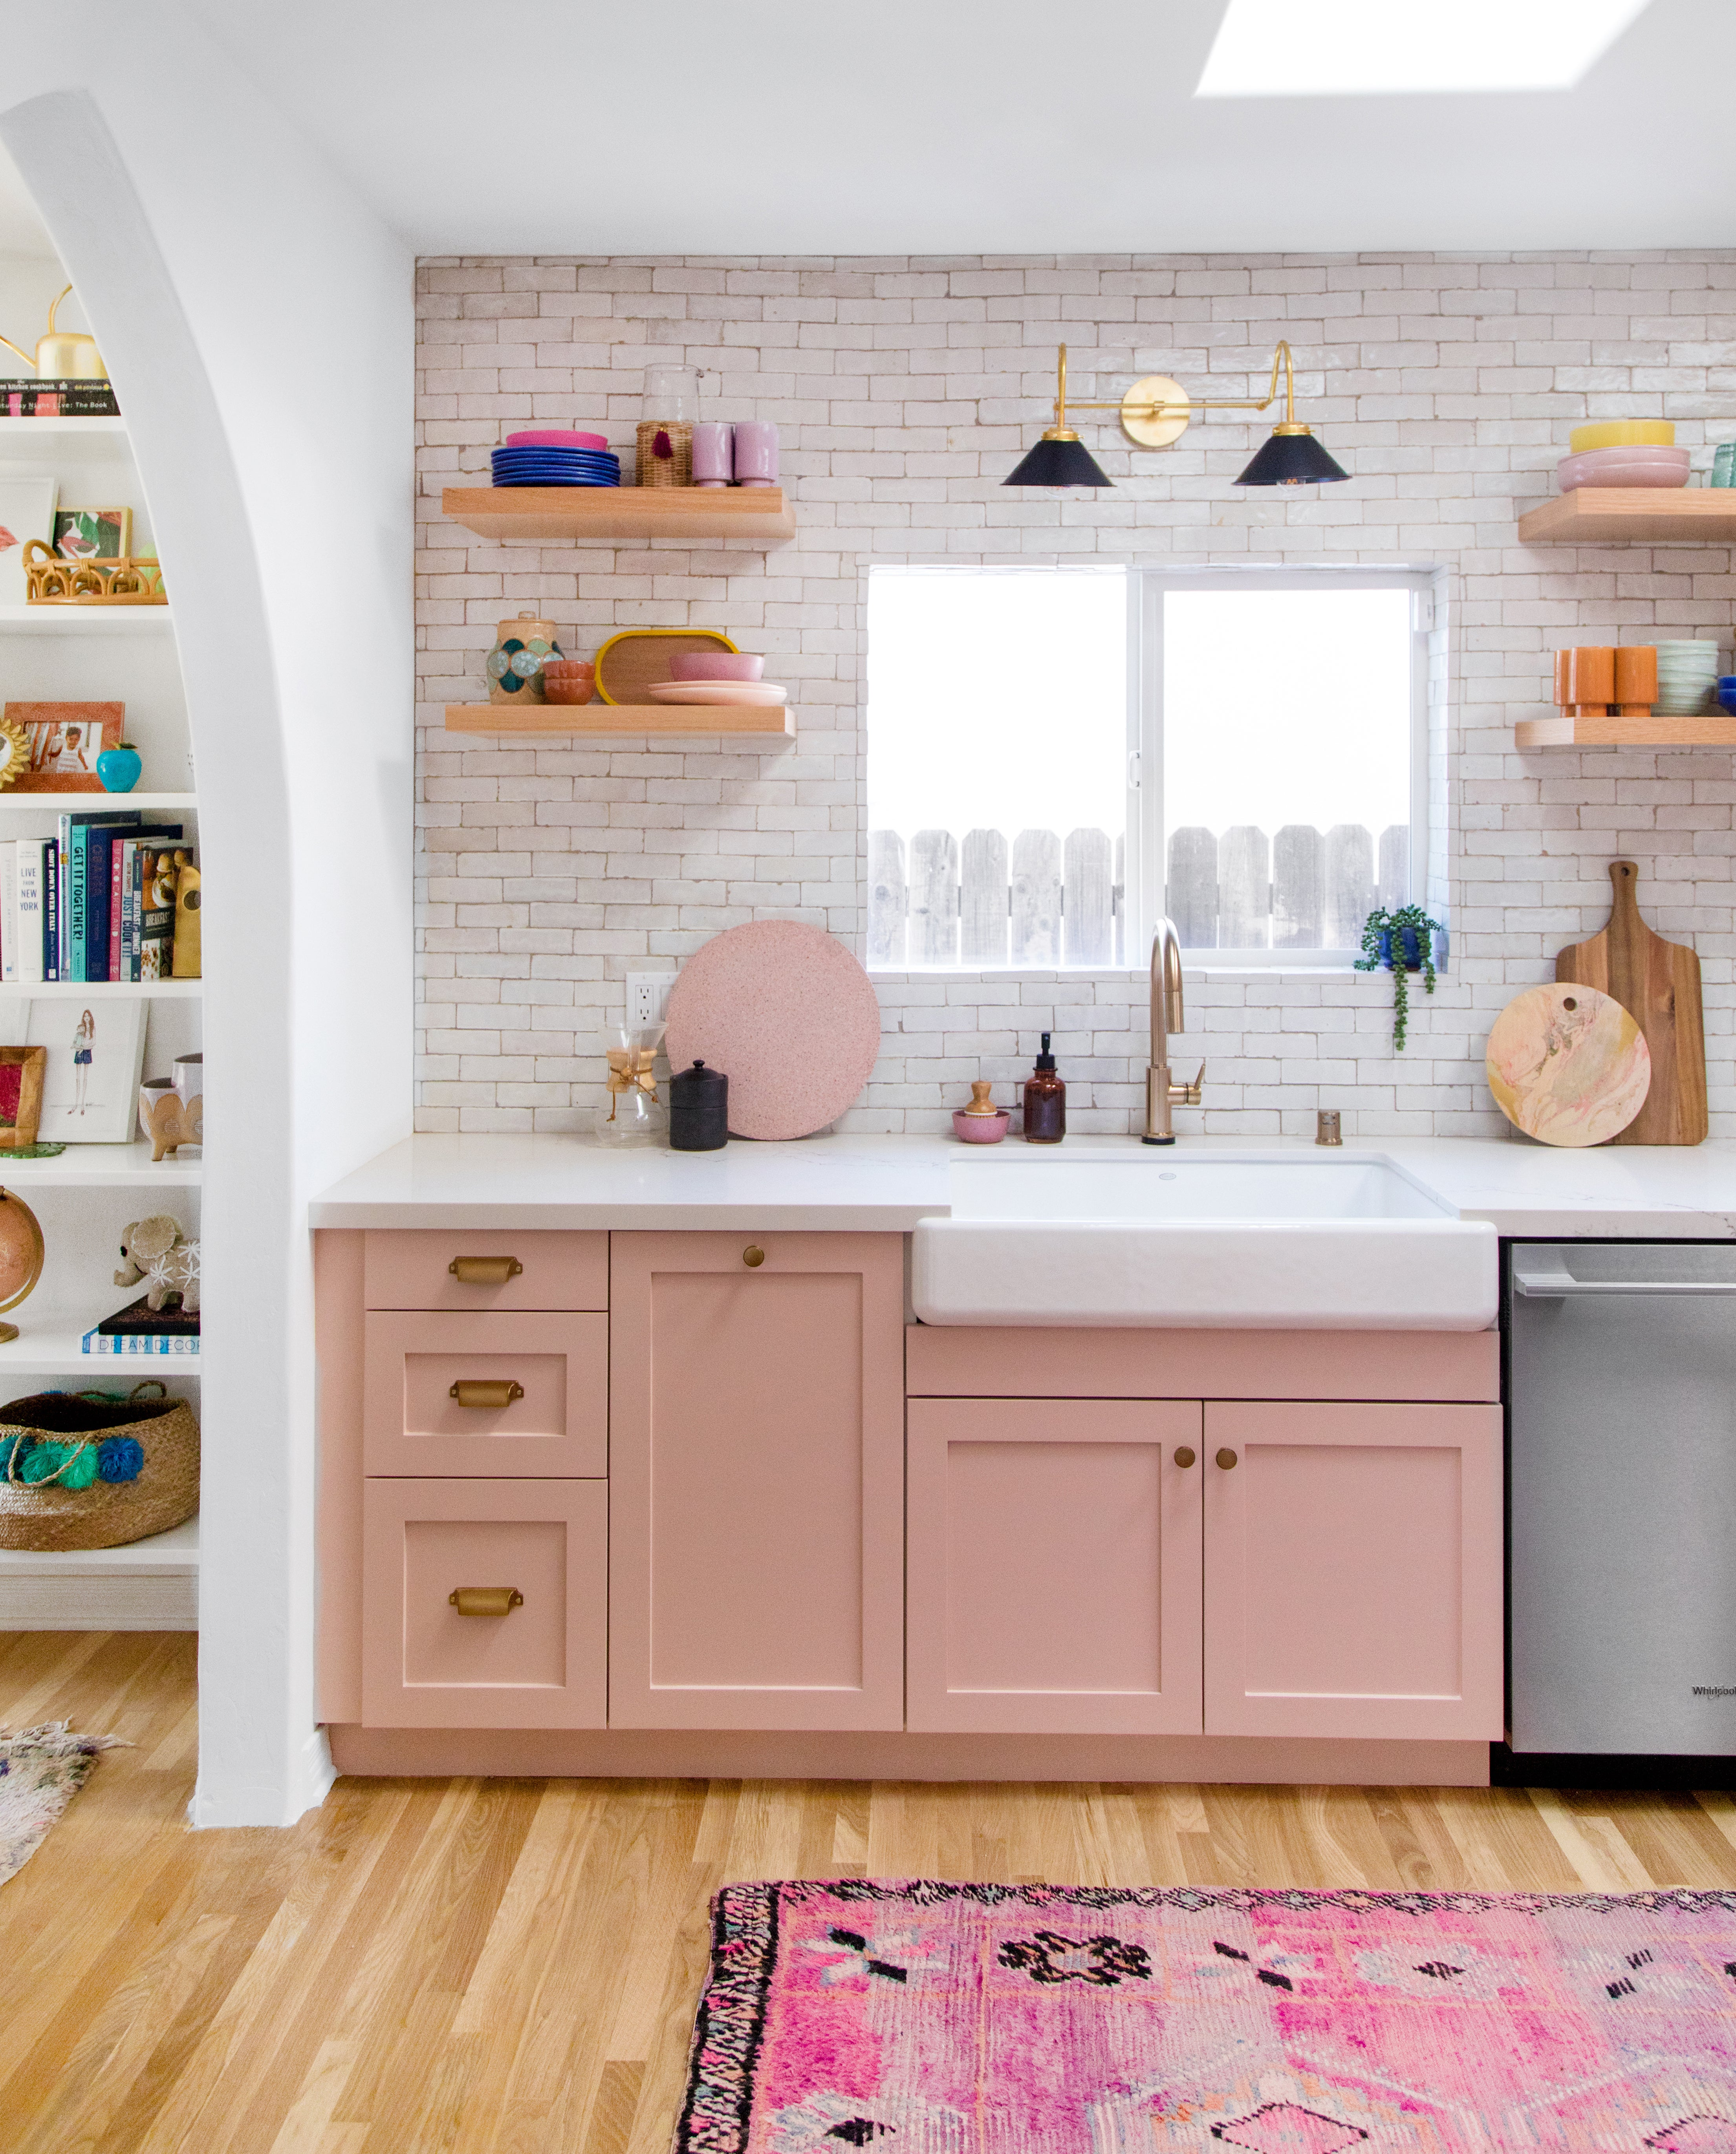 Kitchen Transformations: Studio DIY's Pink Kitchen Transformation Seriously Wows